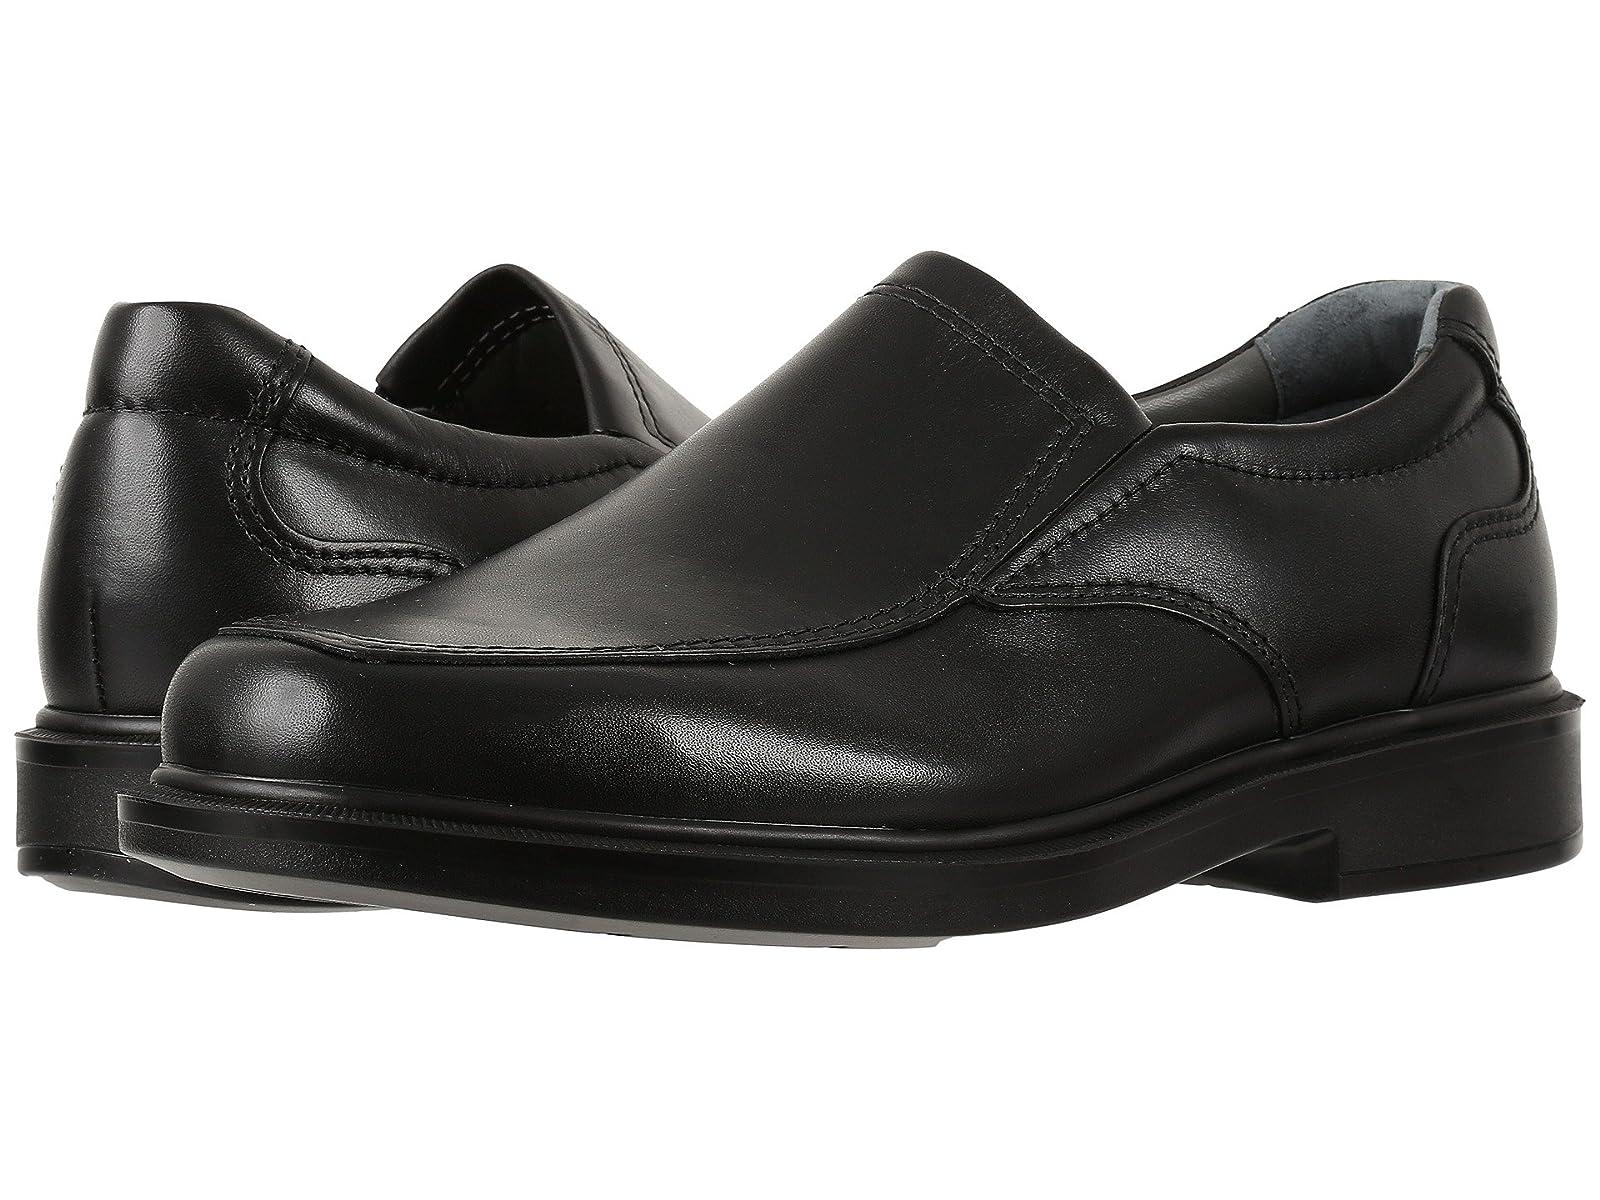 SAS DiplomatAtmospheric grades have affordable shoes